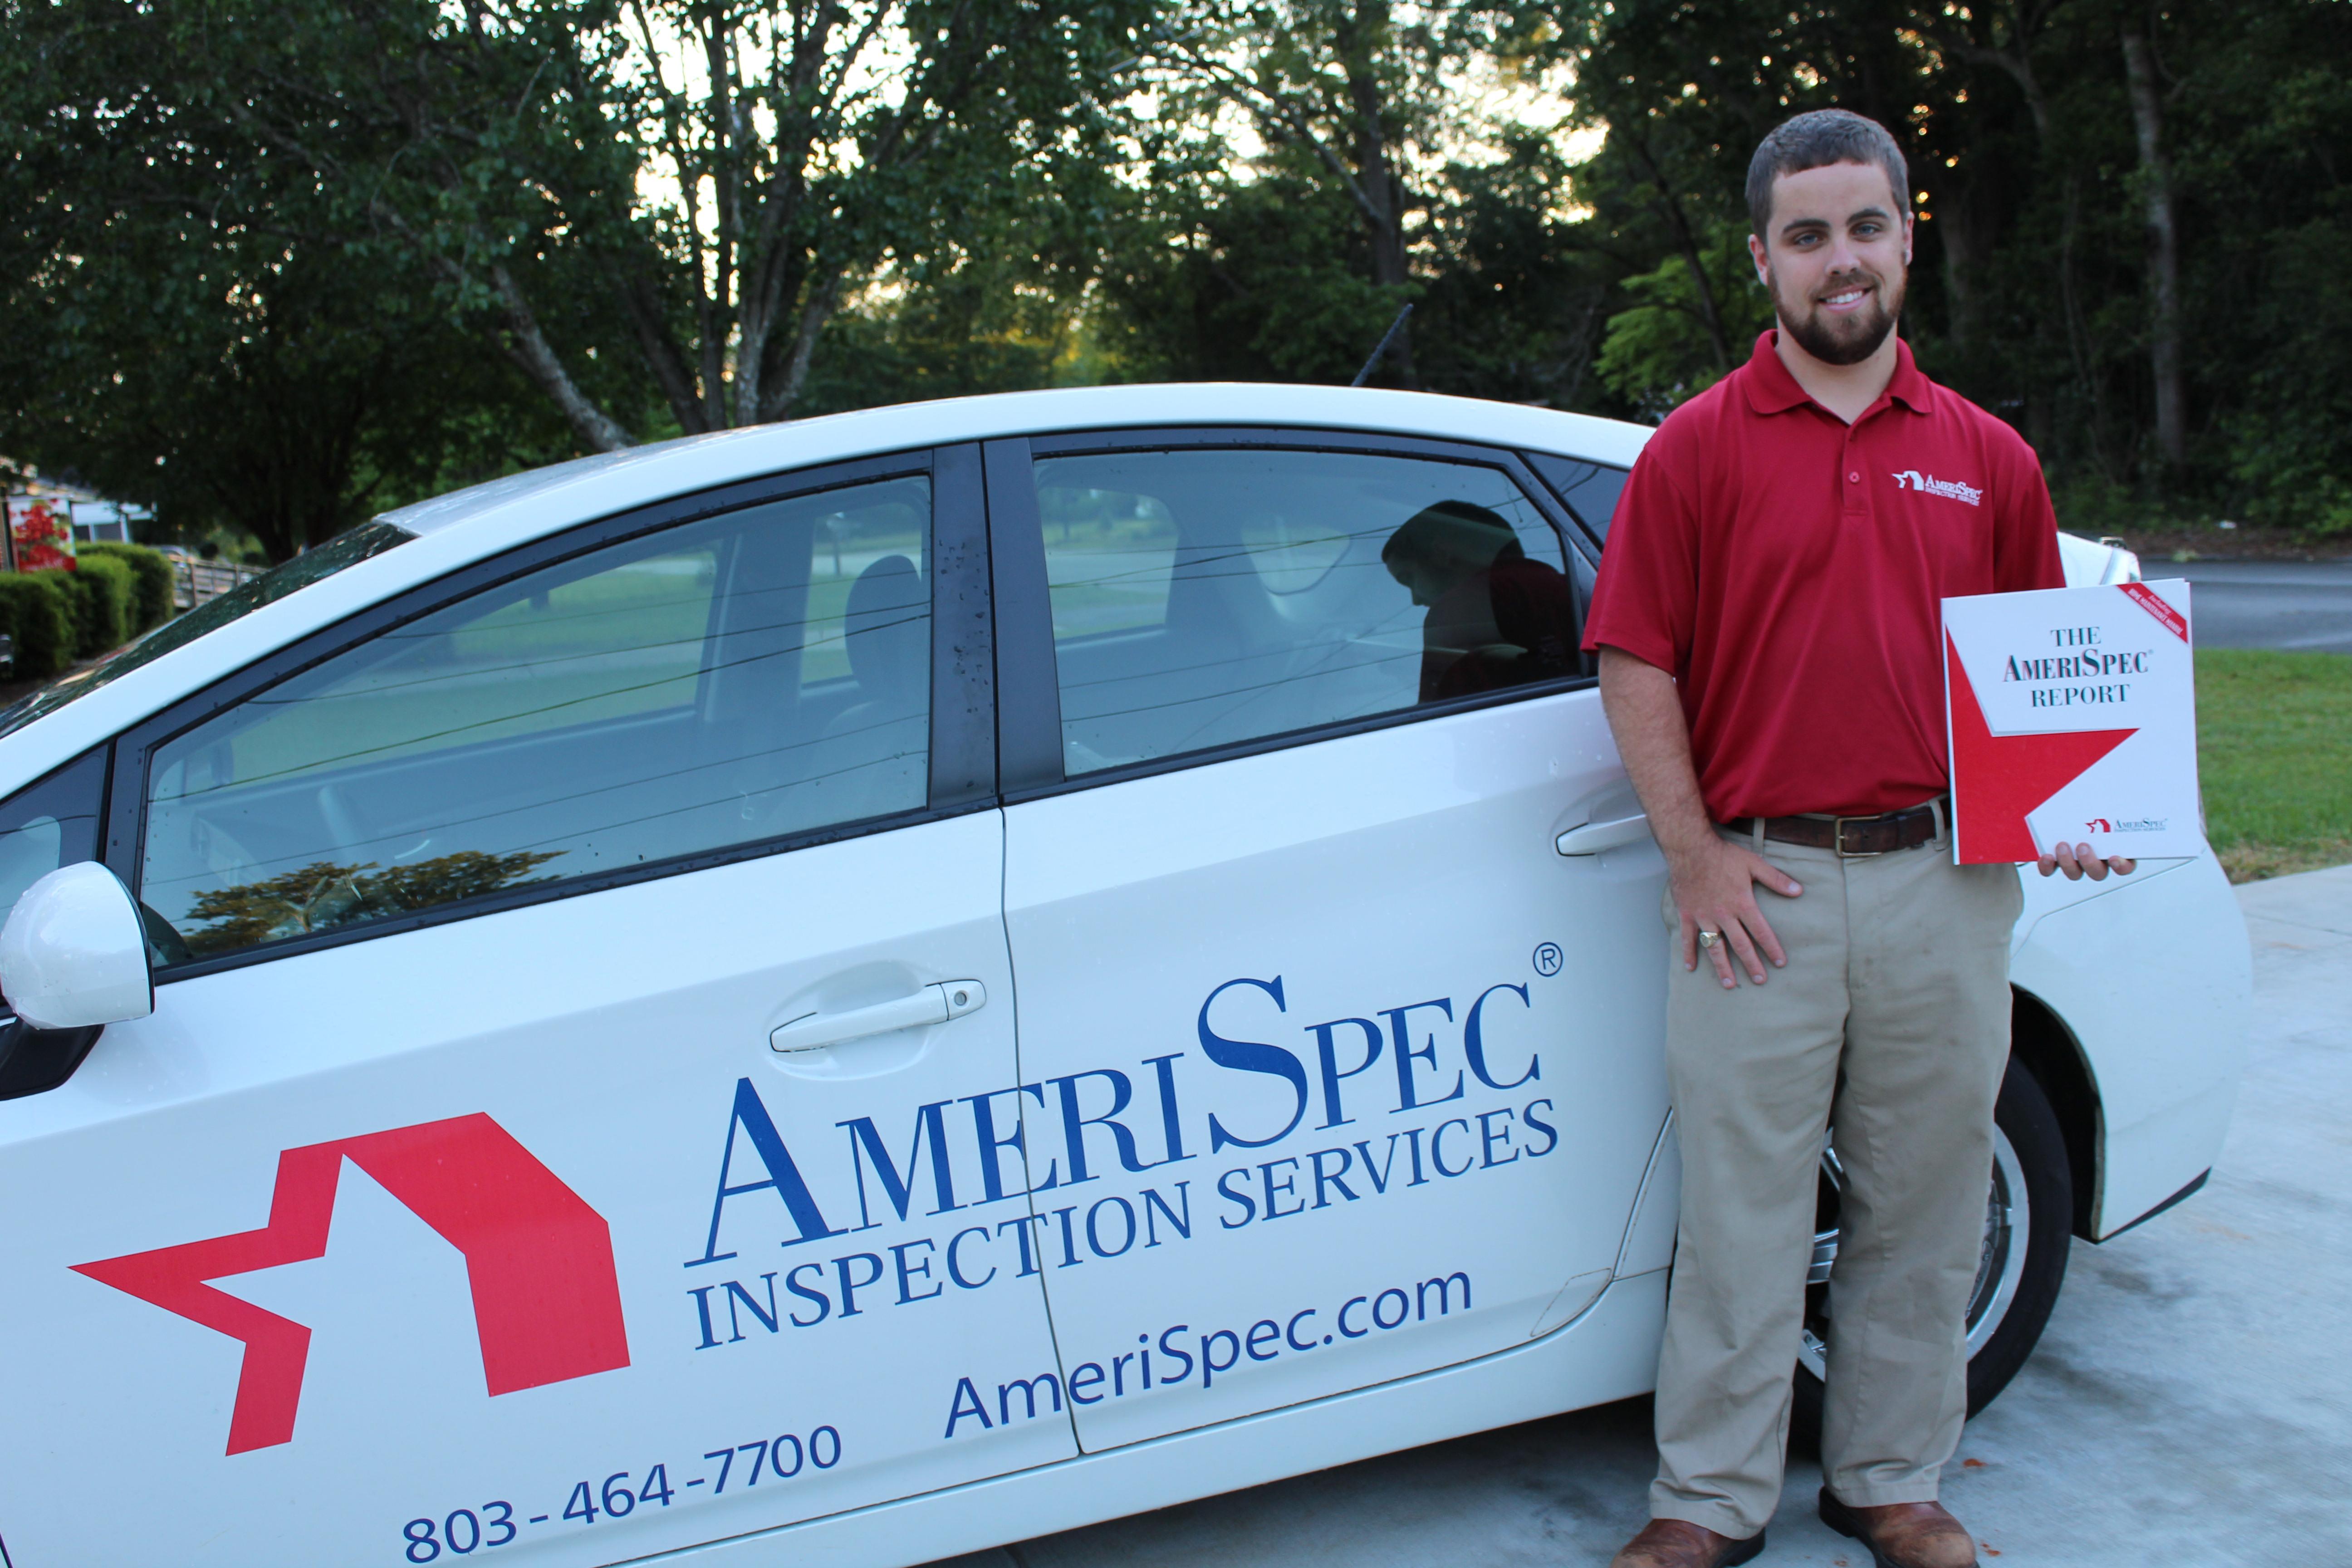 AmeriSpec Inspection Services (Midland & Pee Dee) image 1